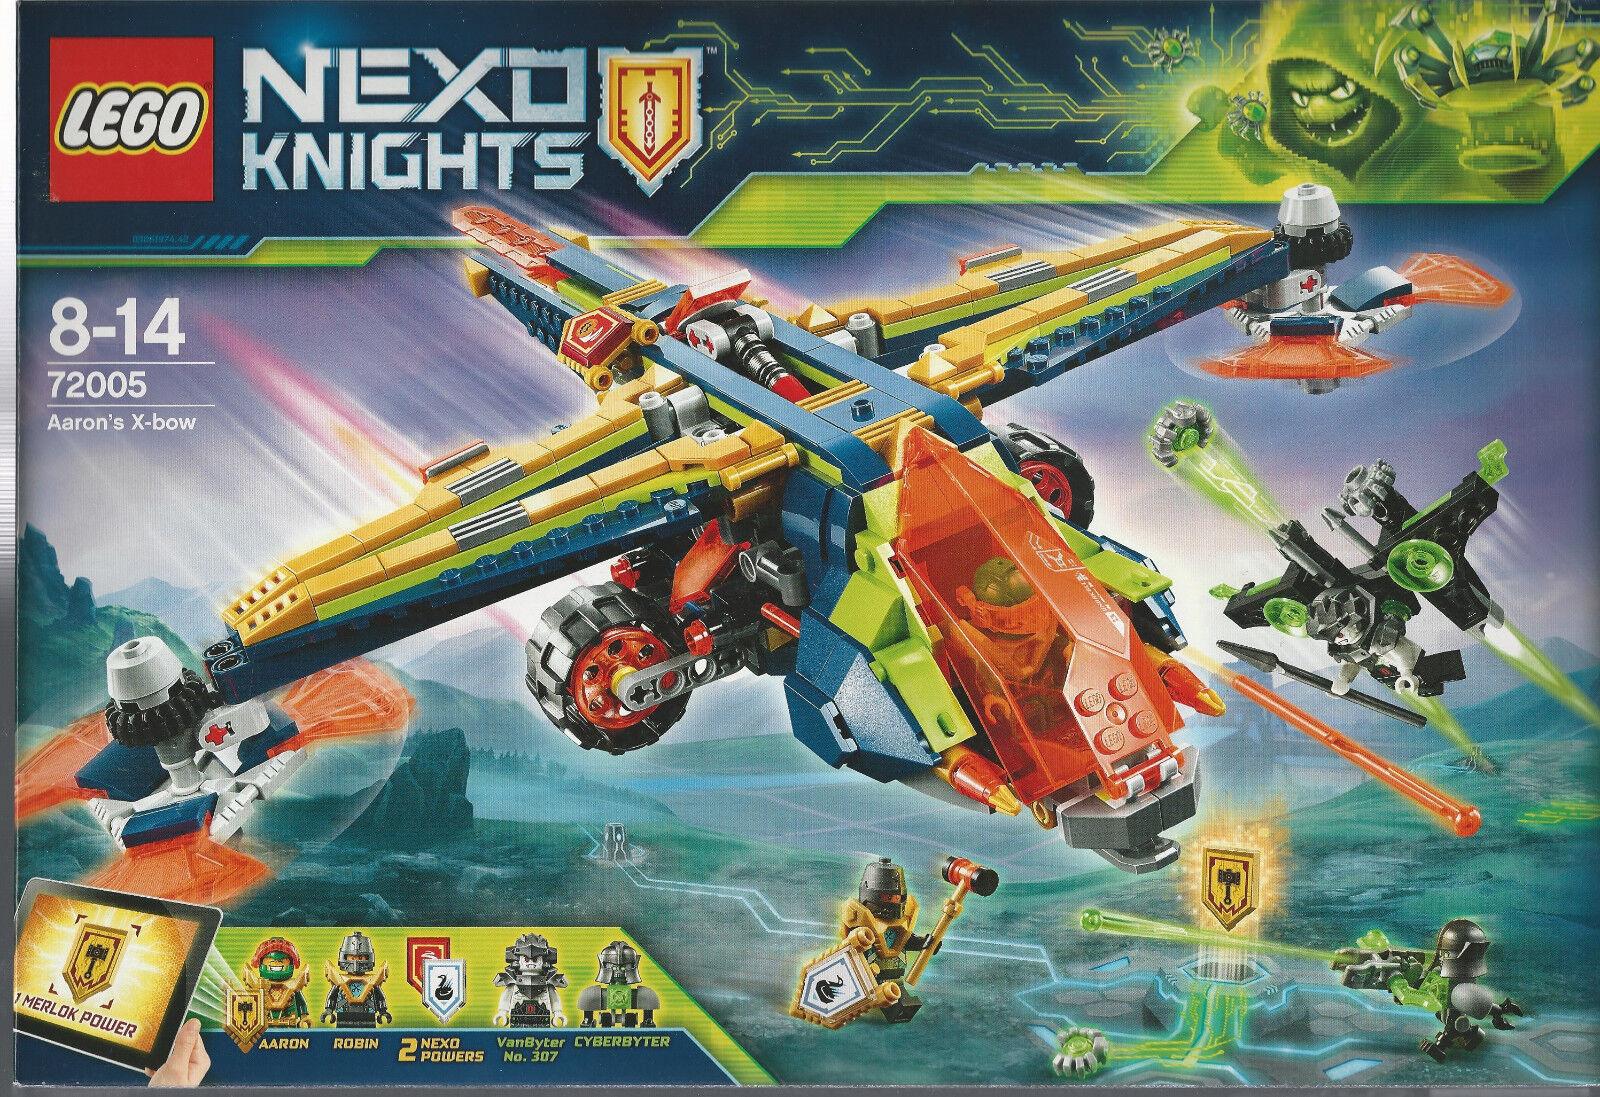 LEGO NEXO KNIGHTS 72005 AARON'S X-BOW  nuovo sigillato NIB w 4 minifigures